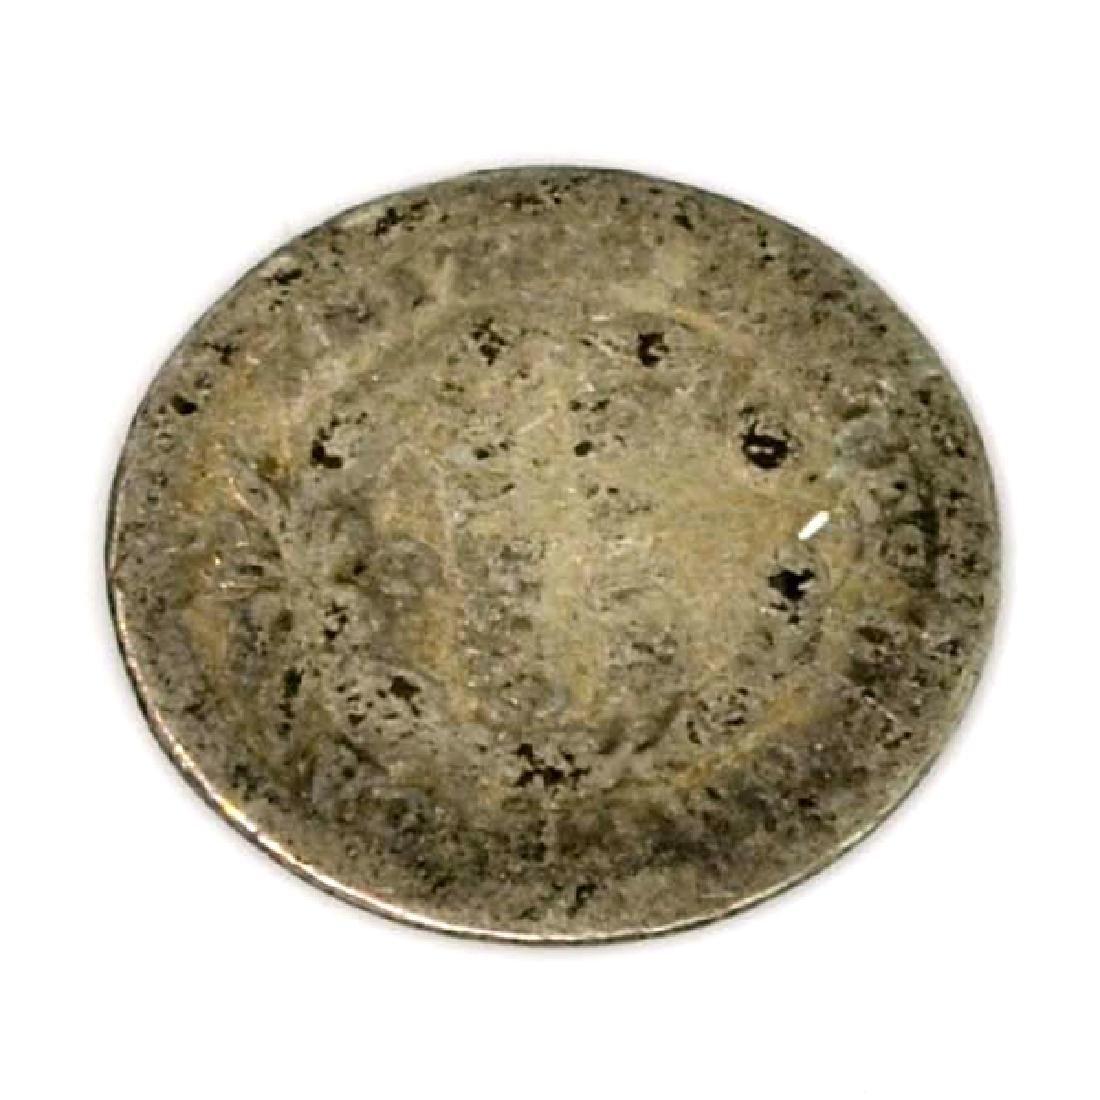 1858-O Liberty Seated Half Dime Coin - 2